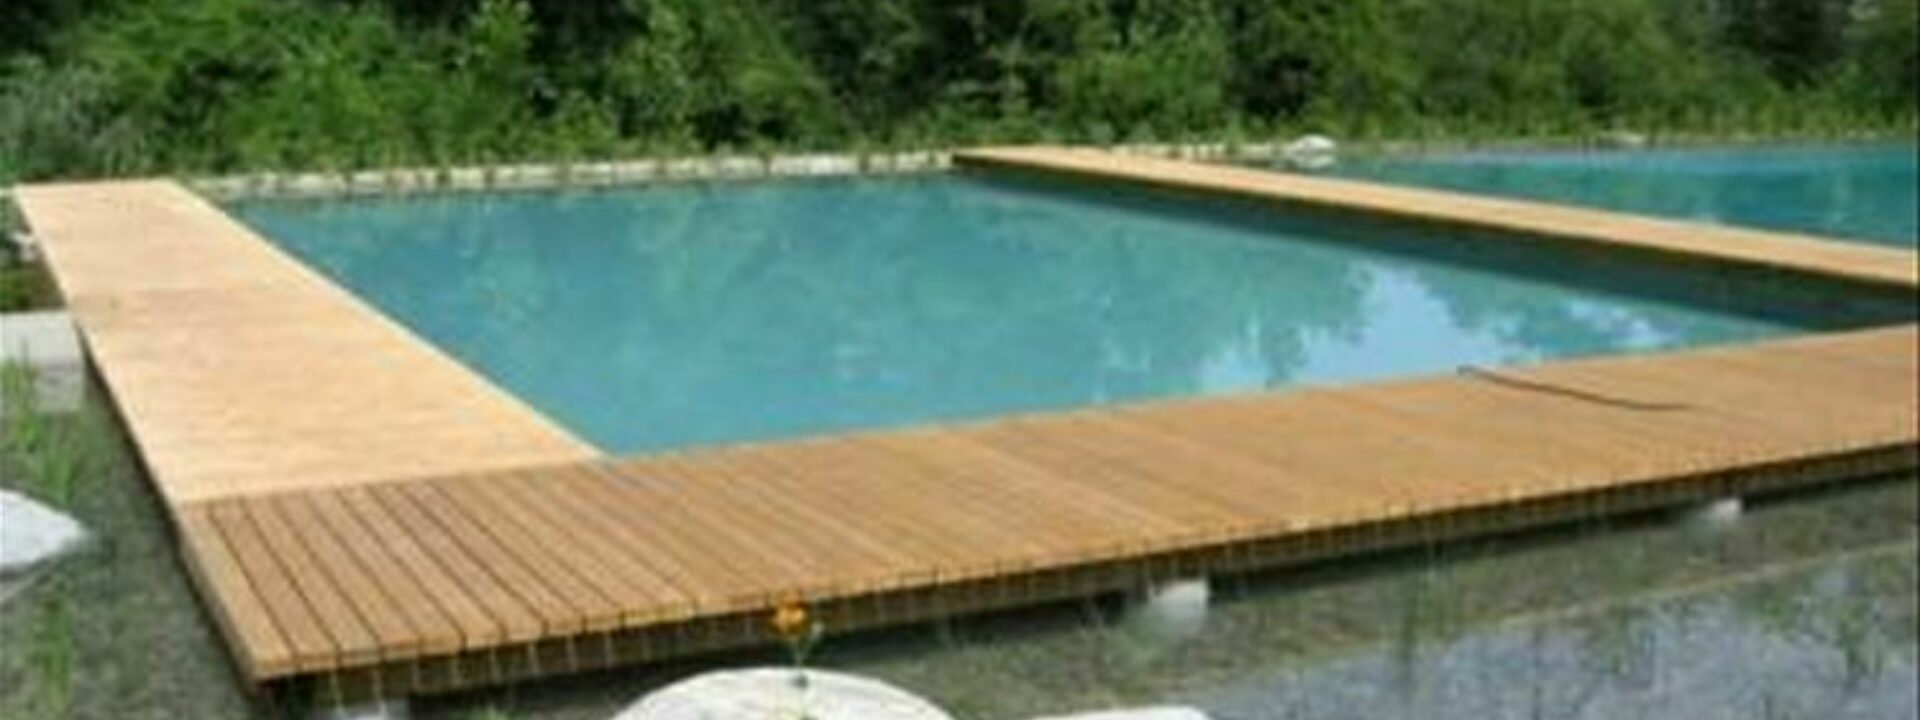 Naturschwimmbad Frohmatt